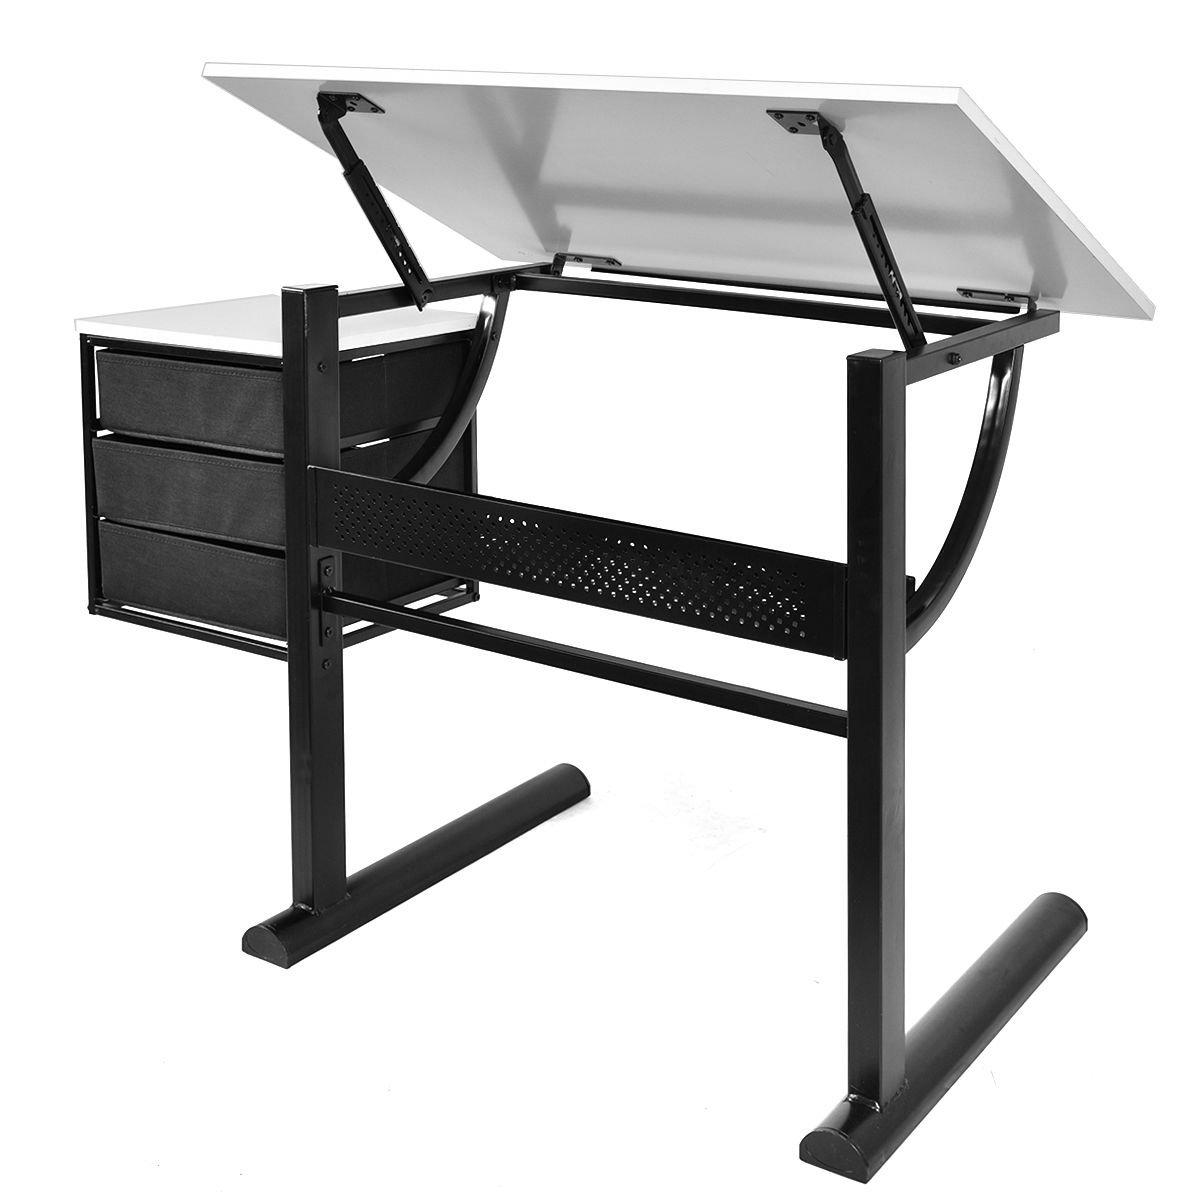 Tangkula Drafting Table Art & Craft Drawing Desk Art Hobby Folding Adjustable w/ Stool